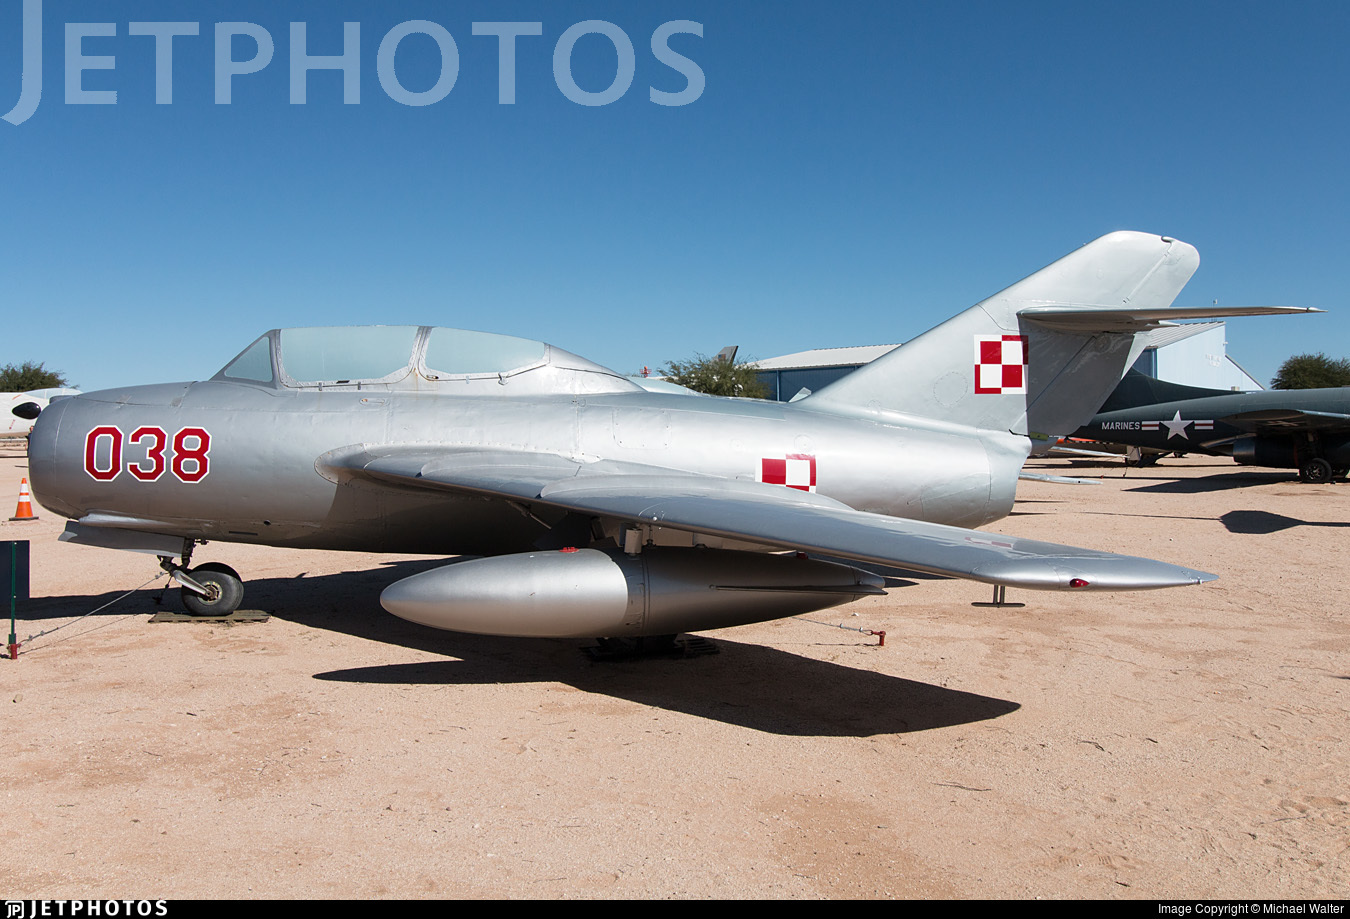 038 - Mikoyan-Gurevich MiG-15 Fagot - Poland - Air Force